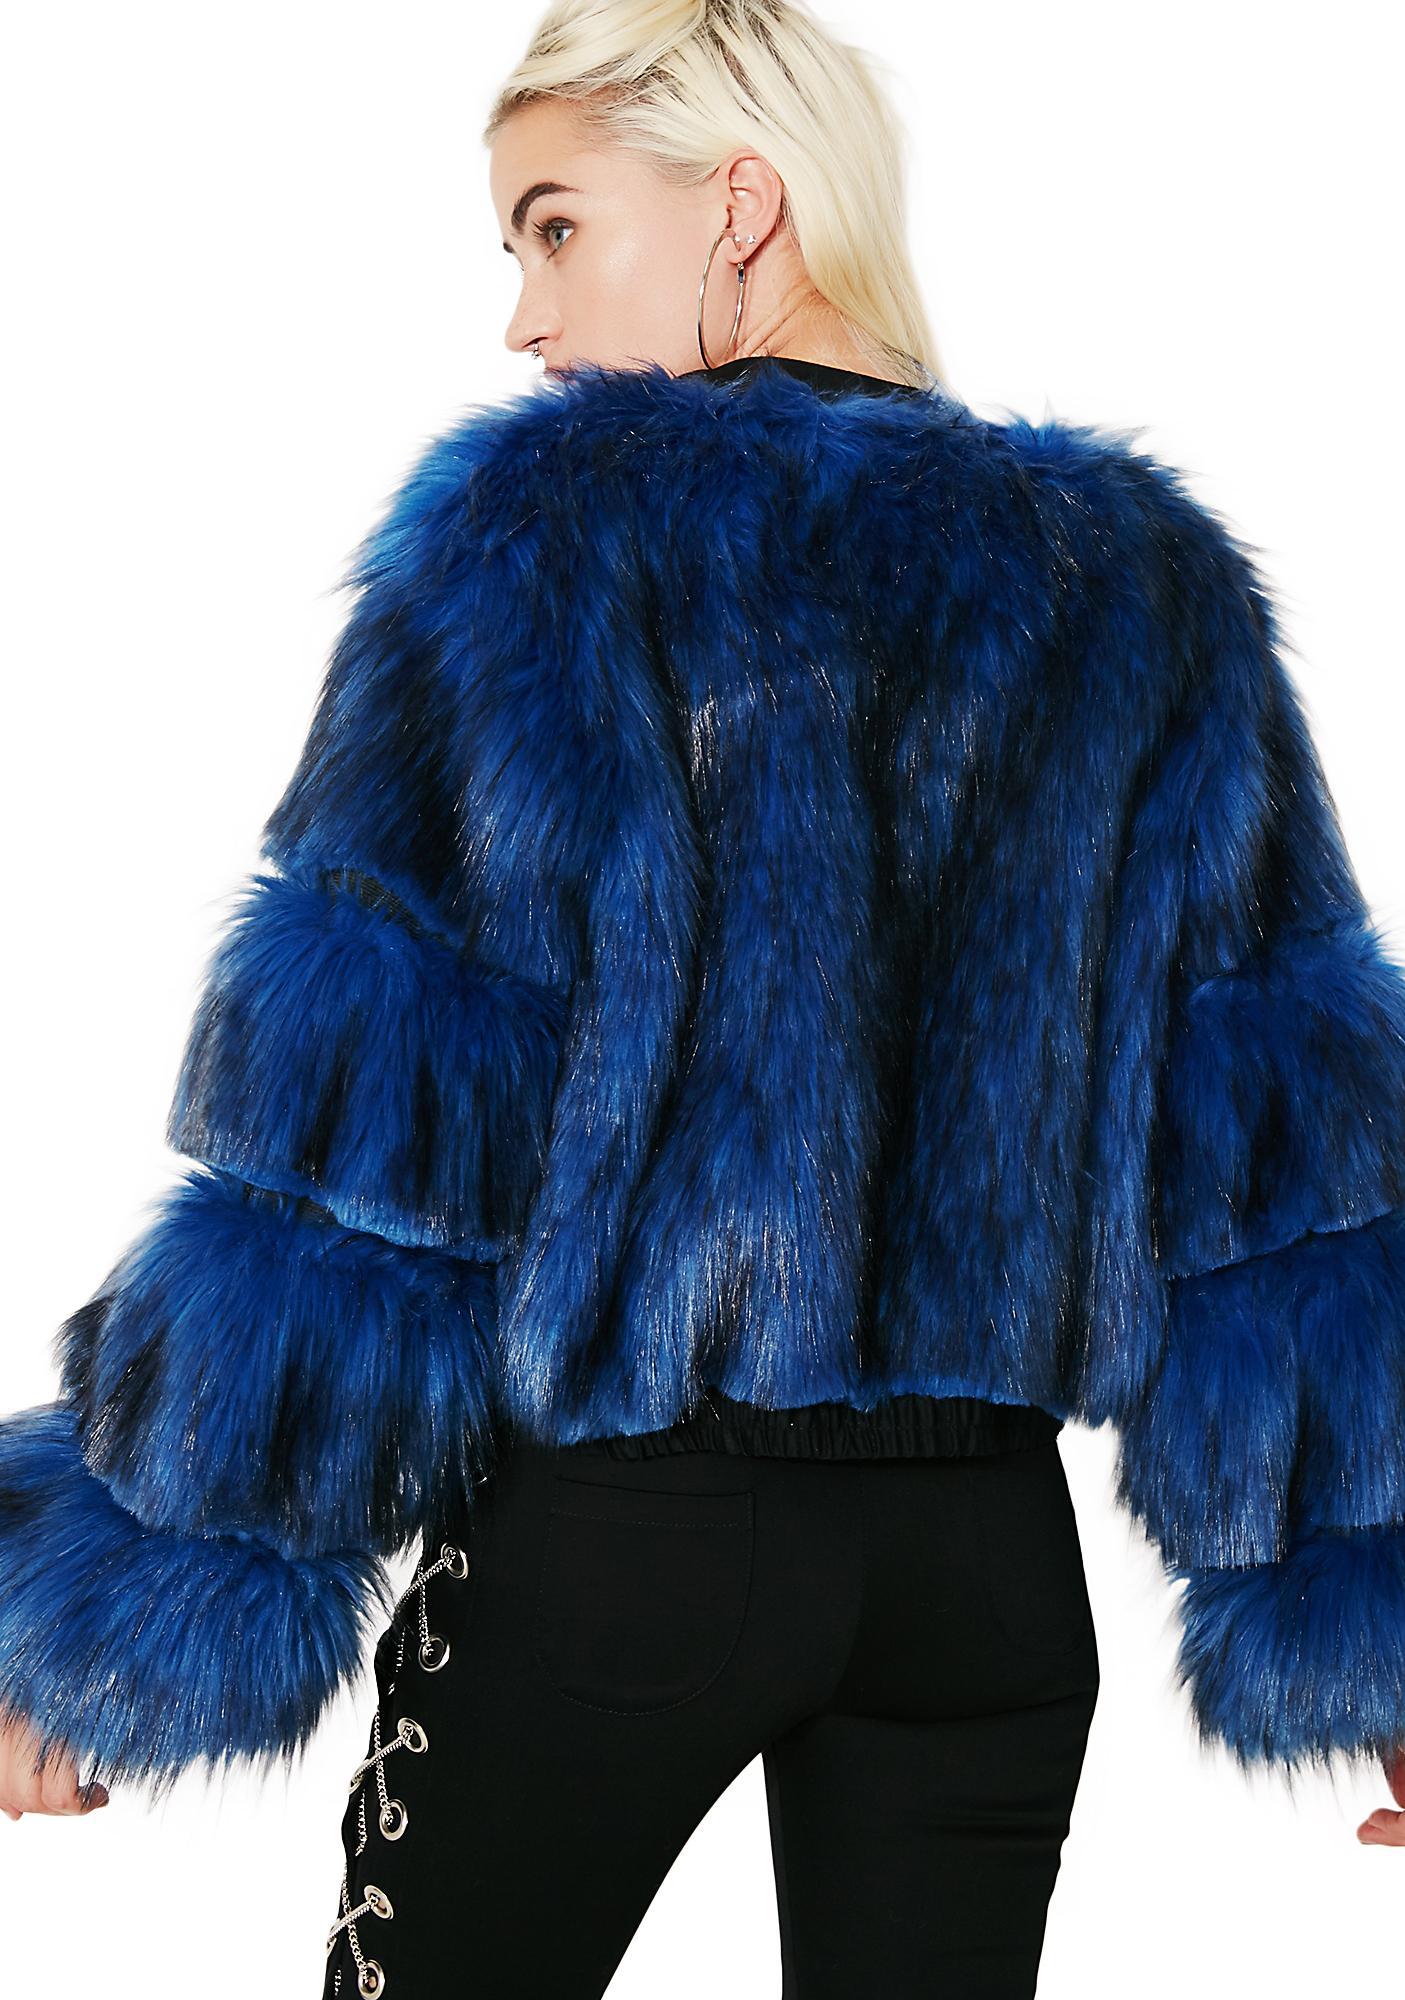 Hardware LDN Moon Baby Fur Bomber Jacket